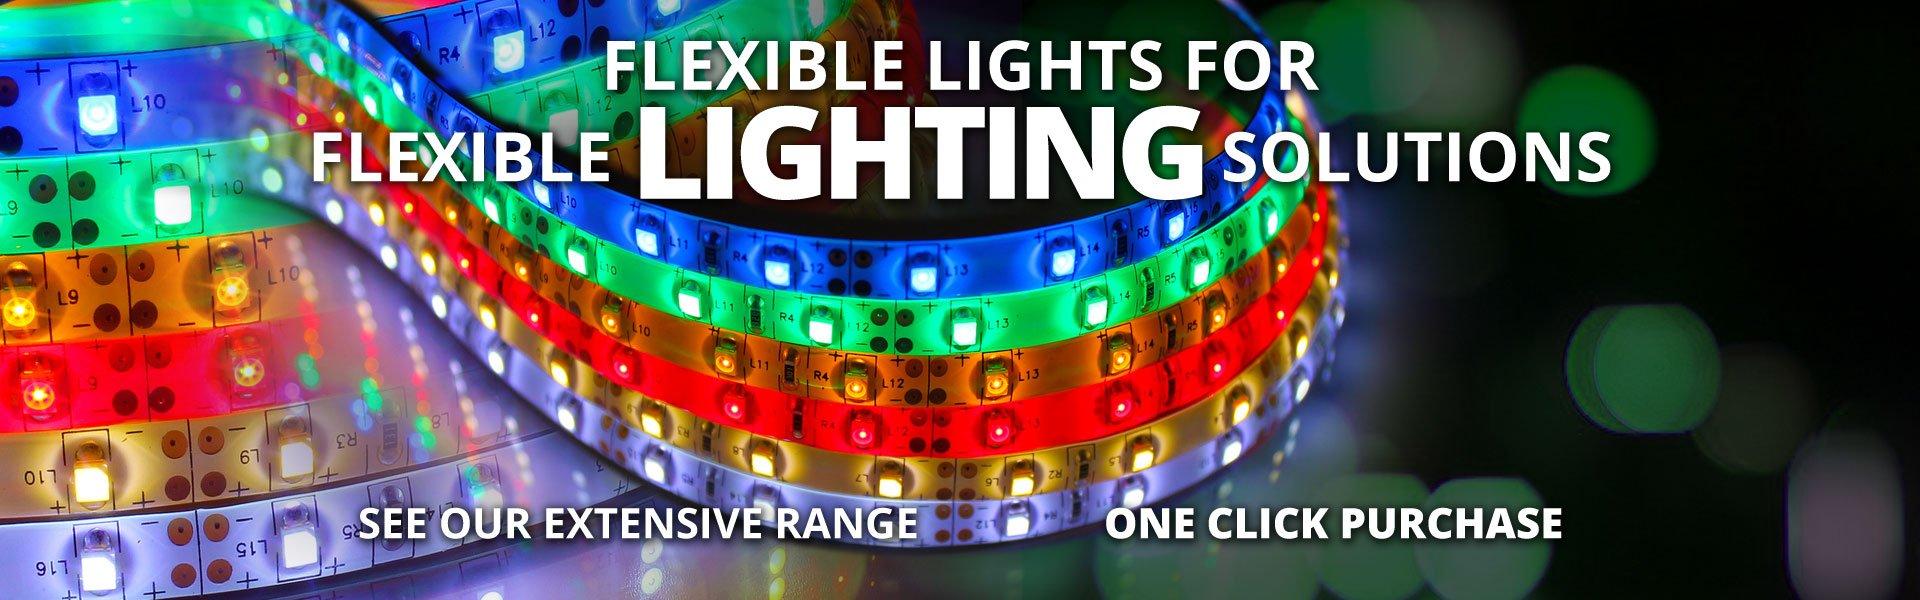 Flexible Lighting Solutions